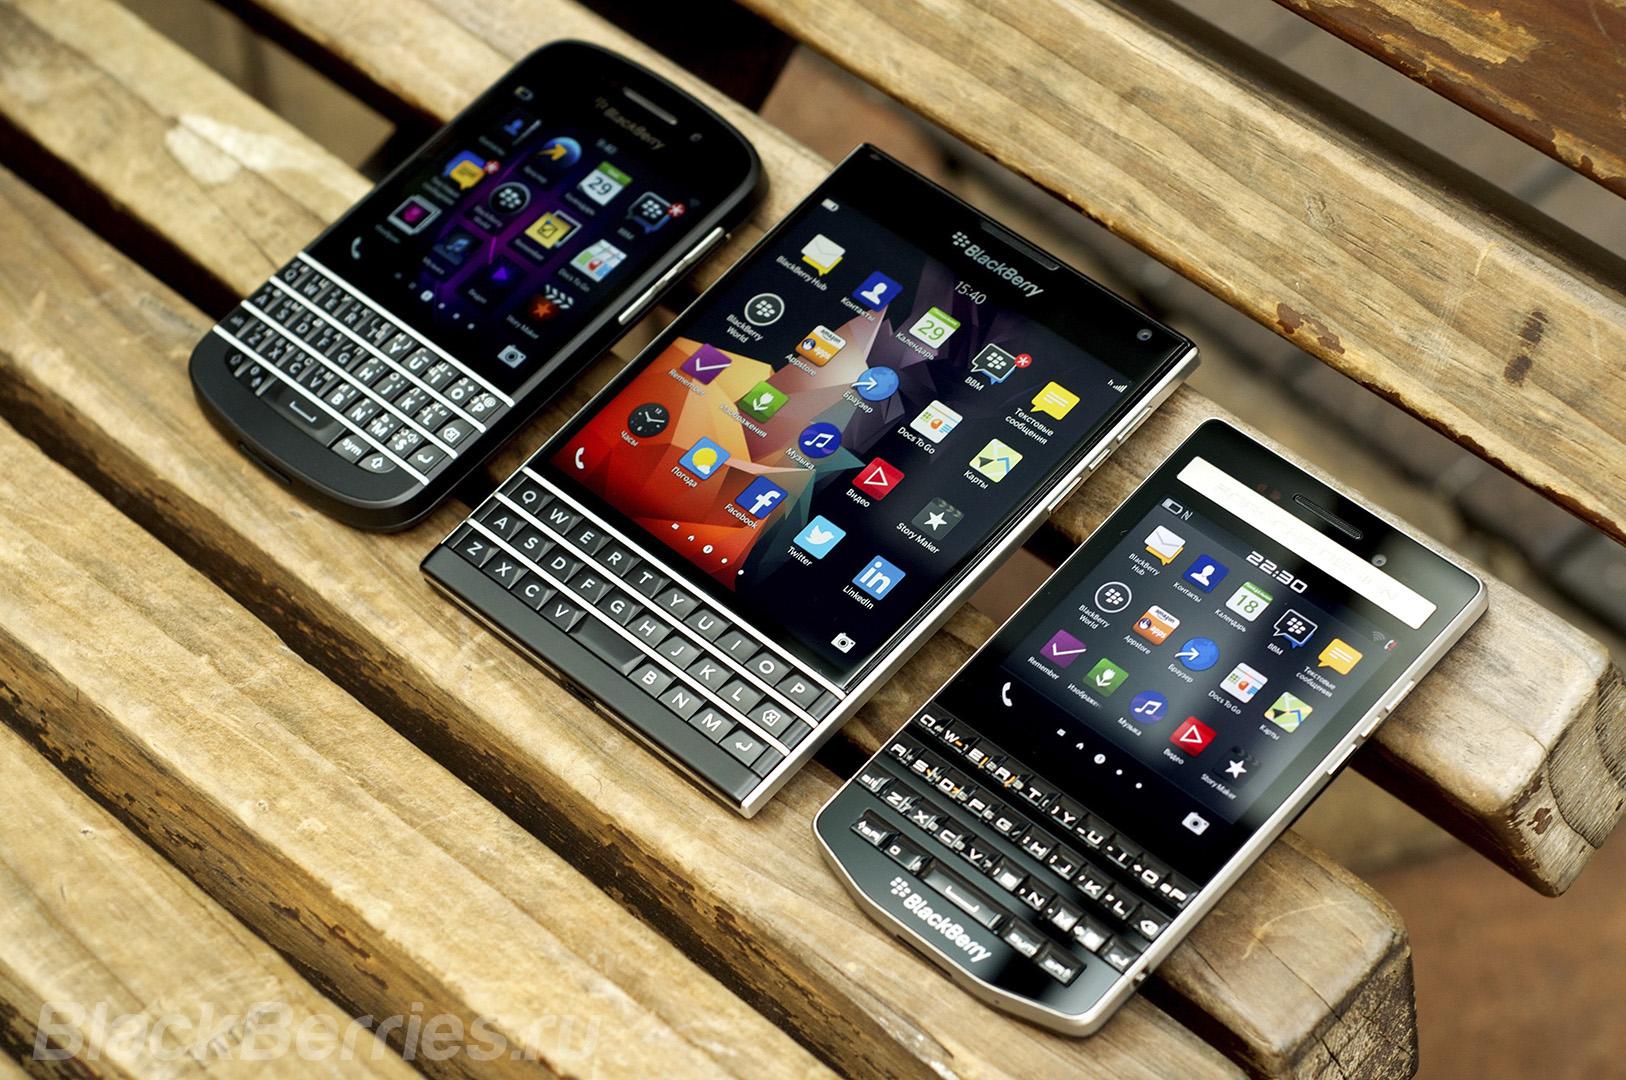 BlackBerry-Passport-Review-2014-05